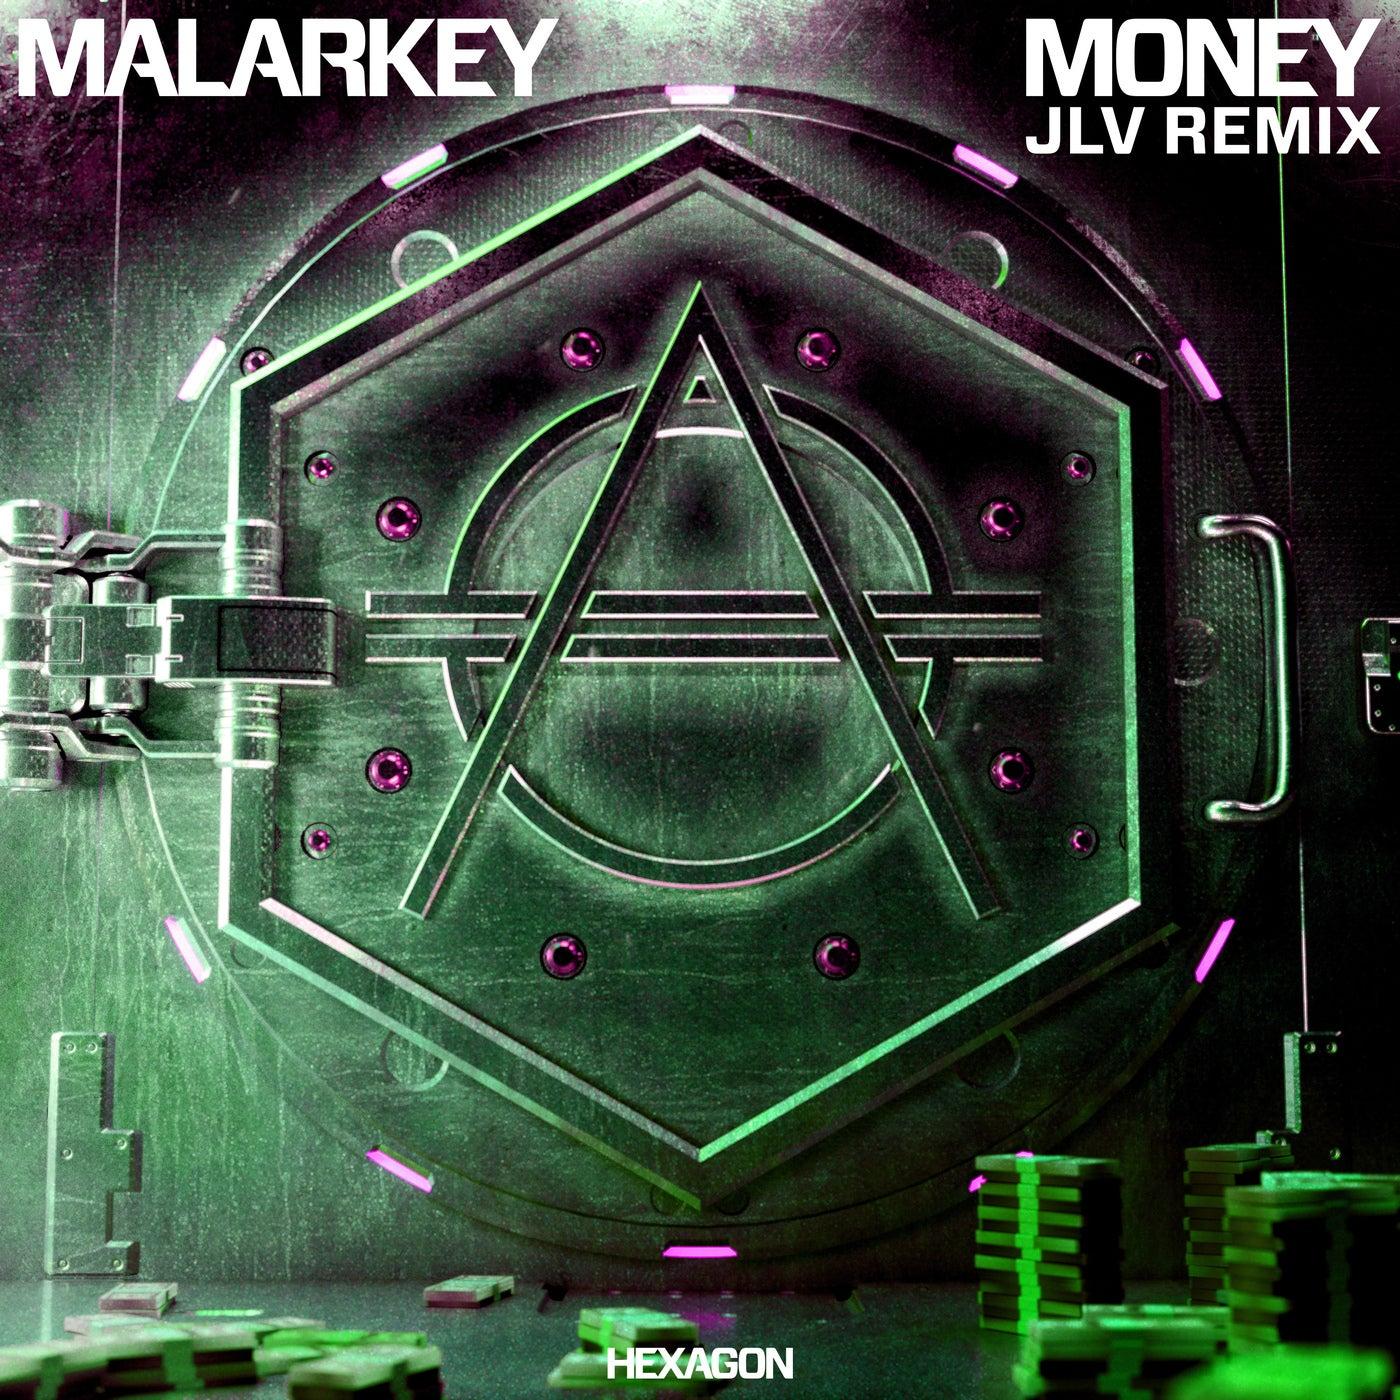 MONEY (JLV Extended Remix)